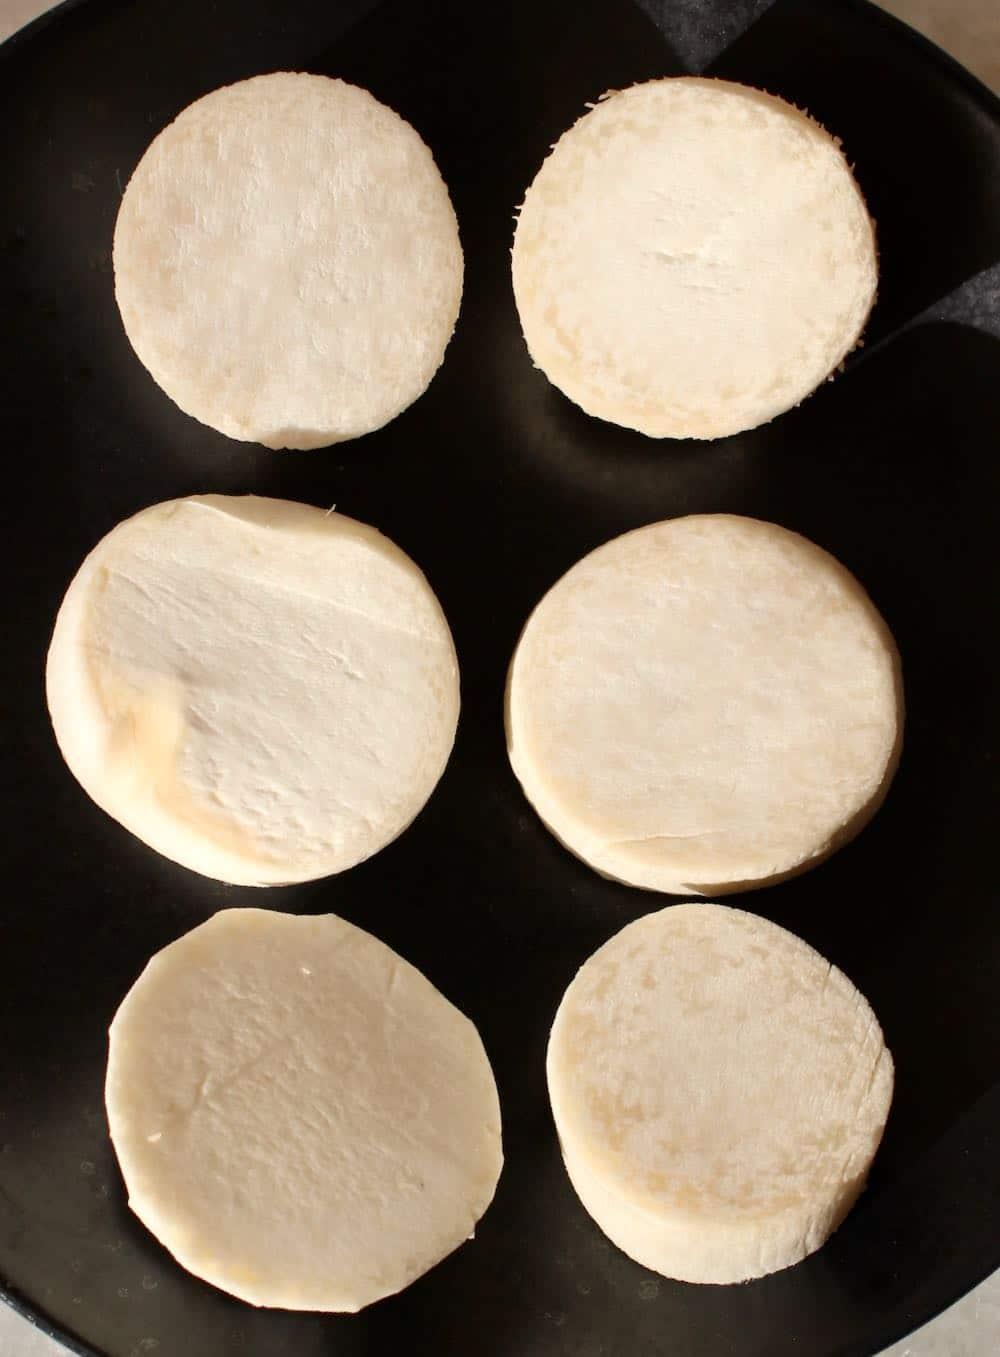 King Oyster Mushroom Scallops